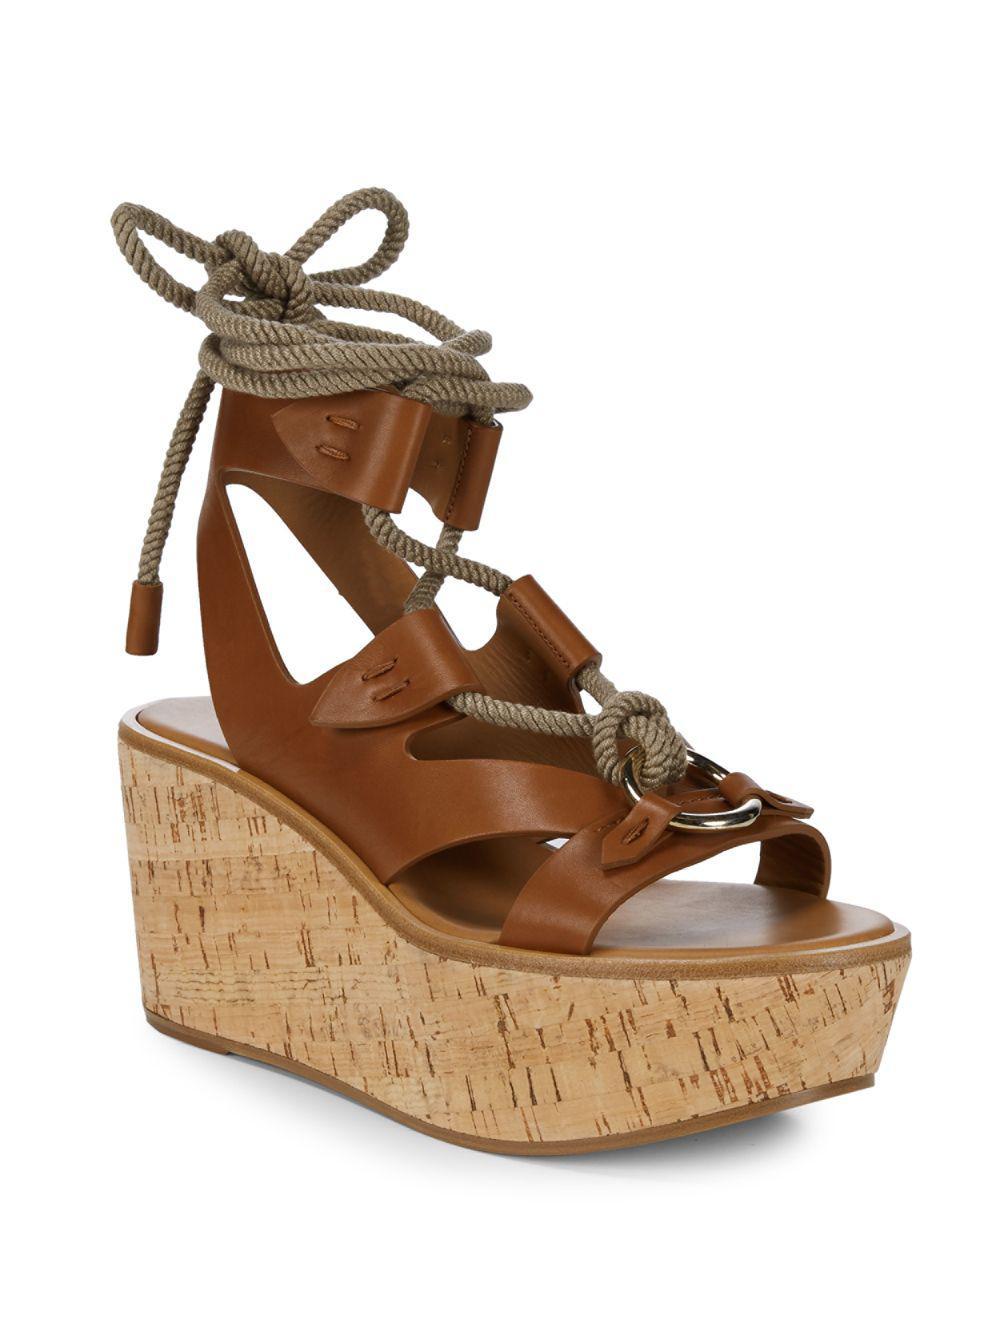 f9aac2434494 Frye - Brown Dahlia Robe Wedge Sandals - Lyst. View fullscreen